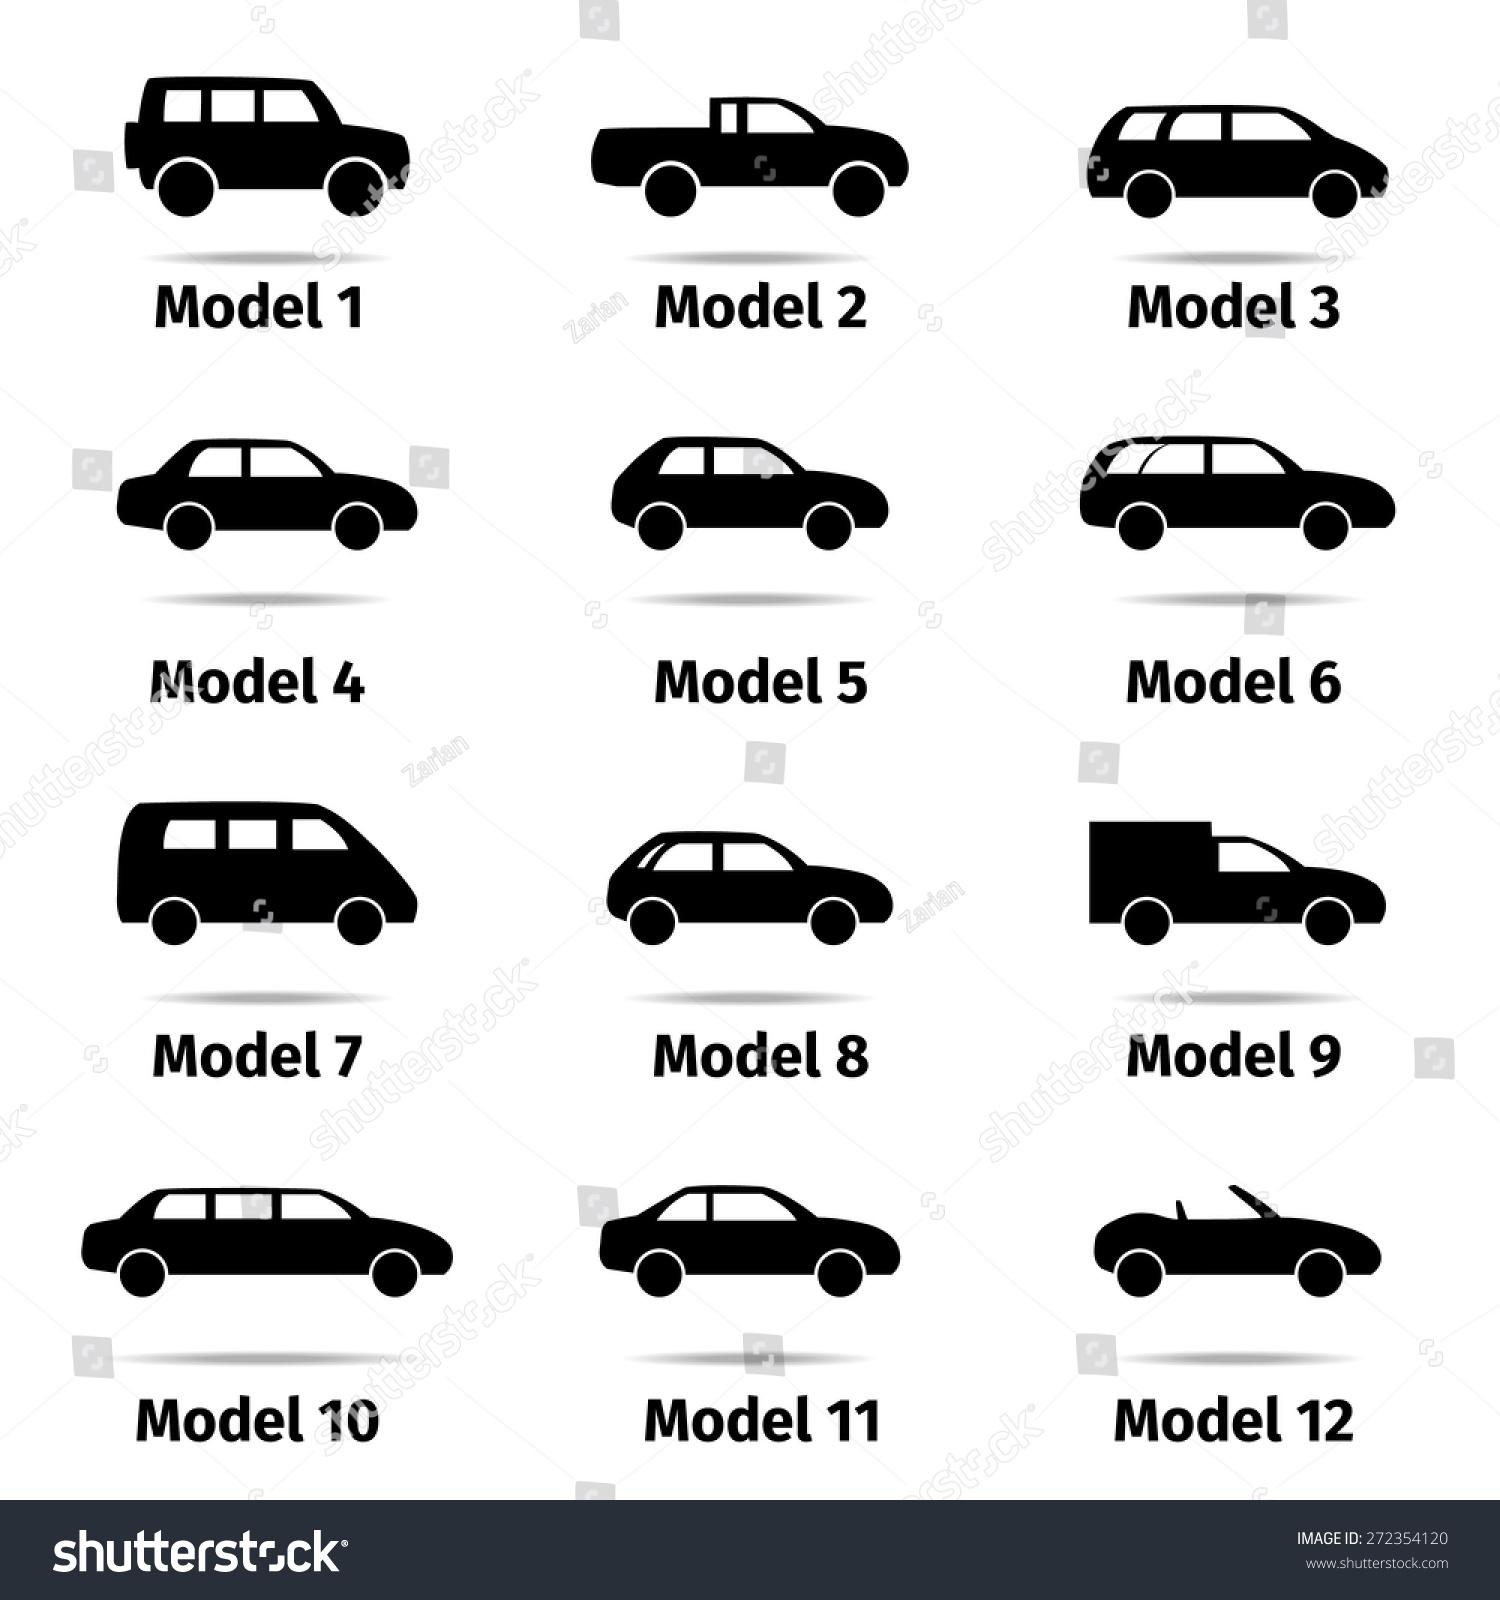 Car Icons Set, Vector Illustration - 272354120 : Shutterstock